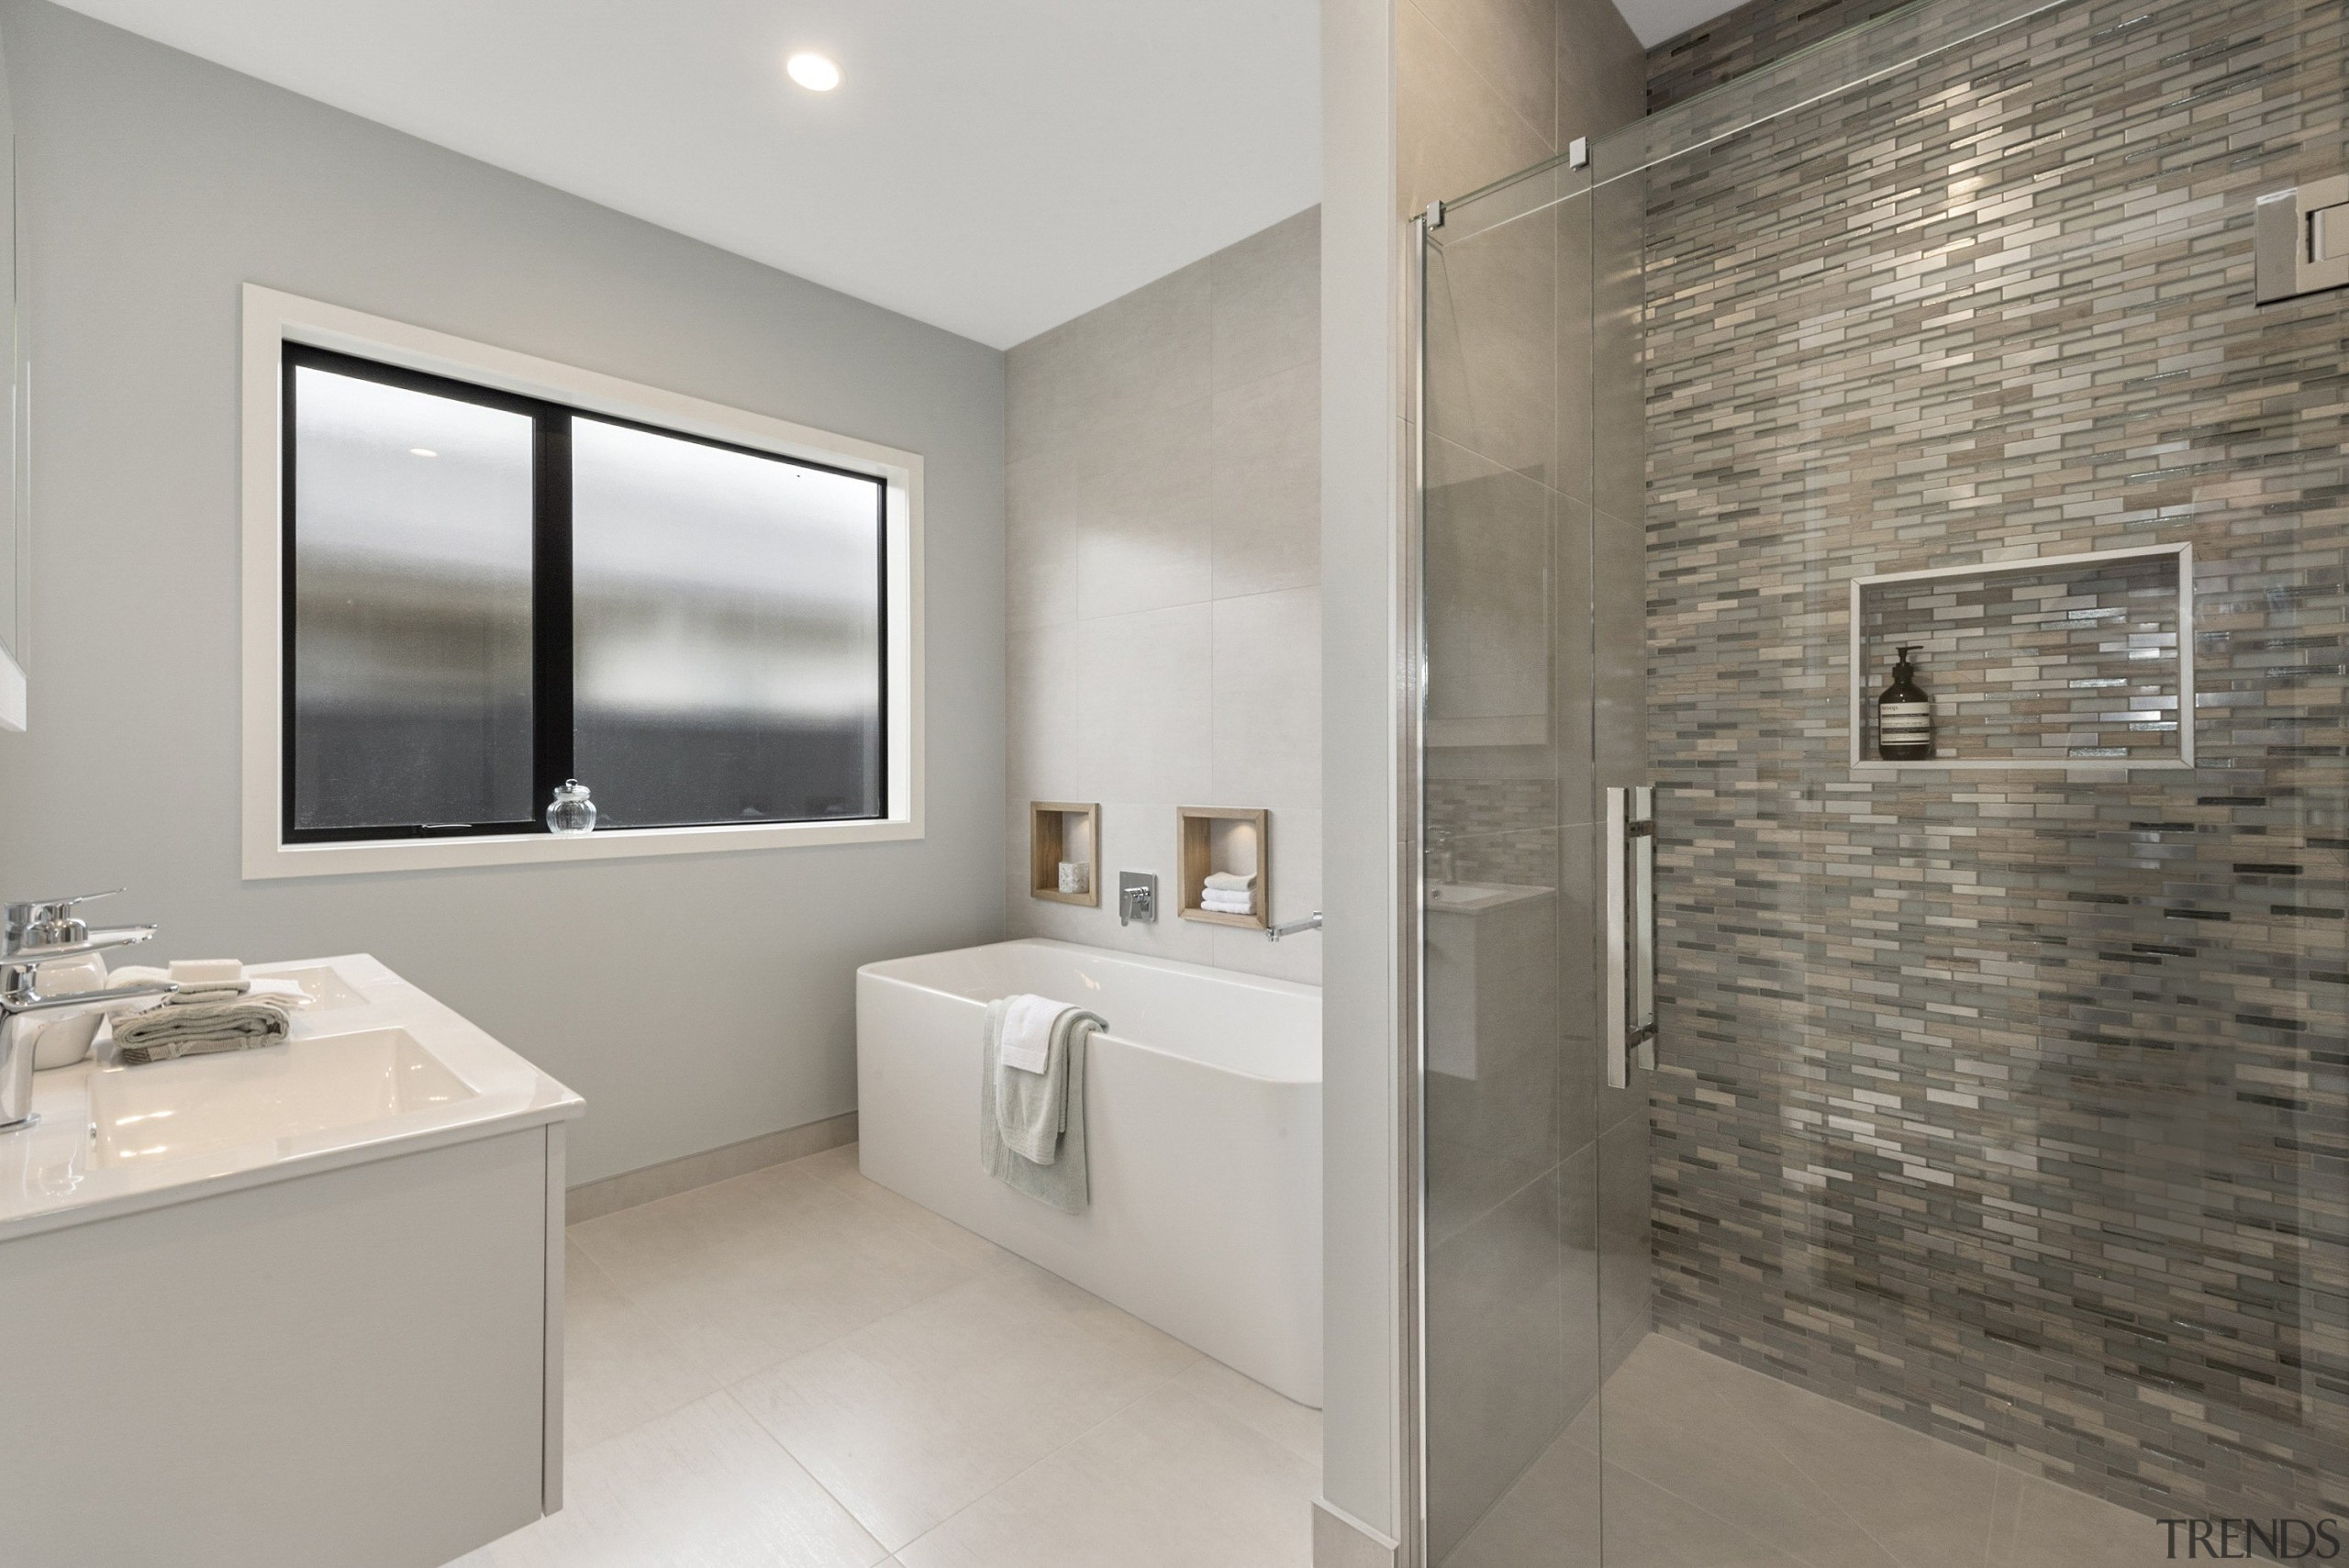 Tiled shower with frameless glass, and Otto freestanding bathroom, floor, home, interior design, property, real estate, room, sink, tile, gray